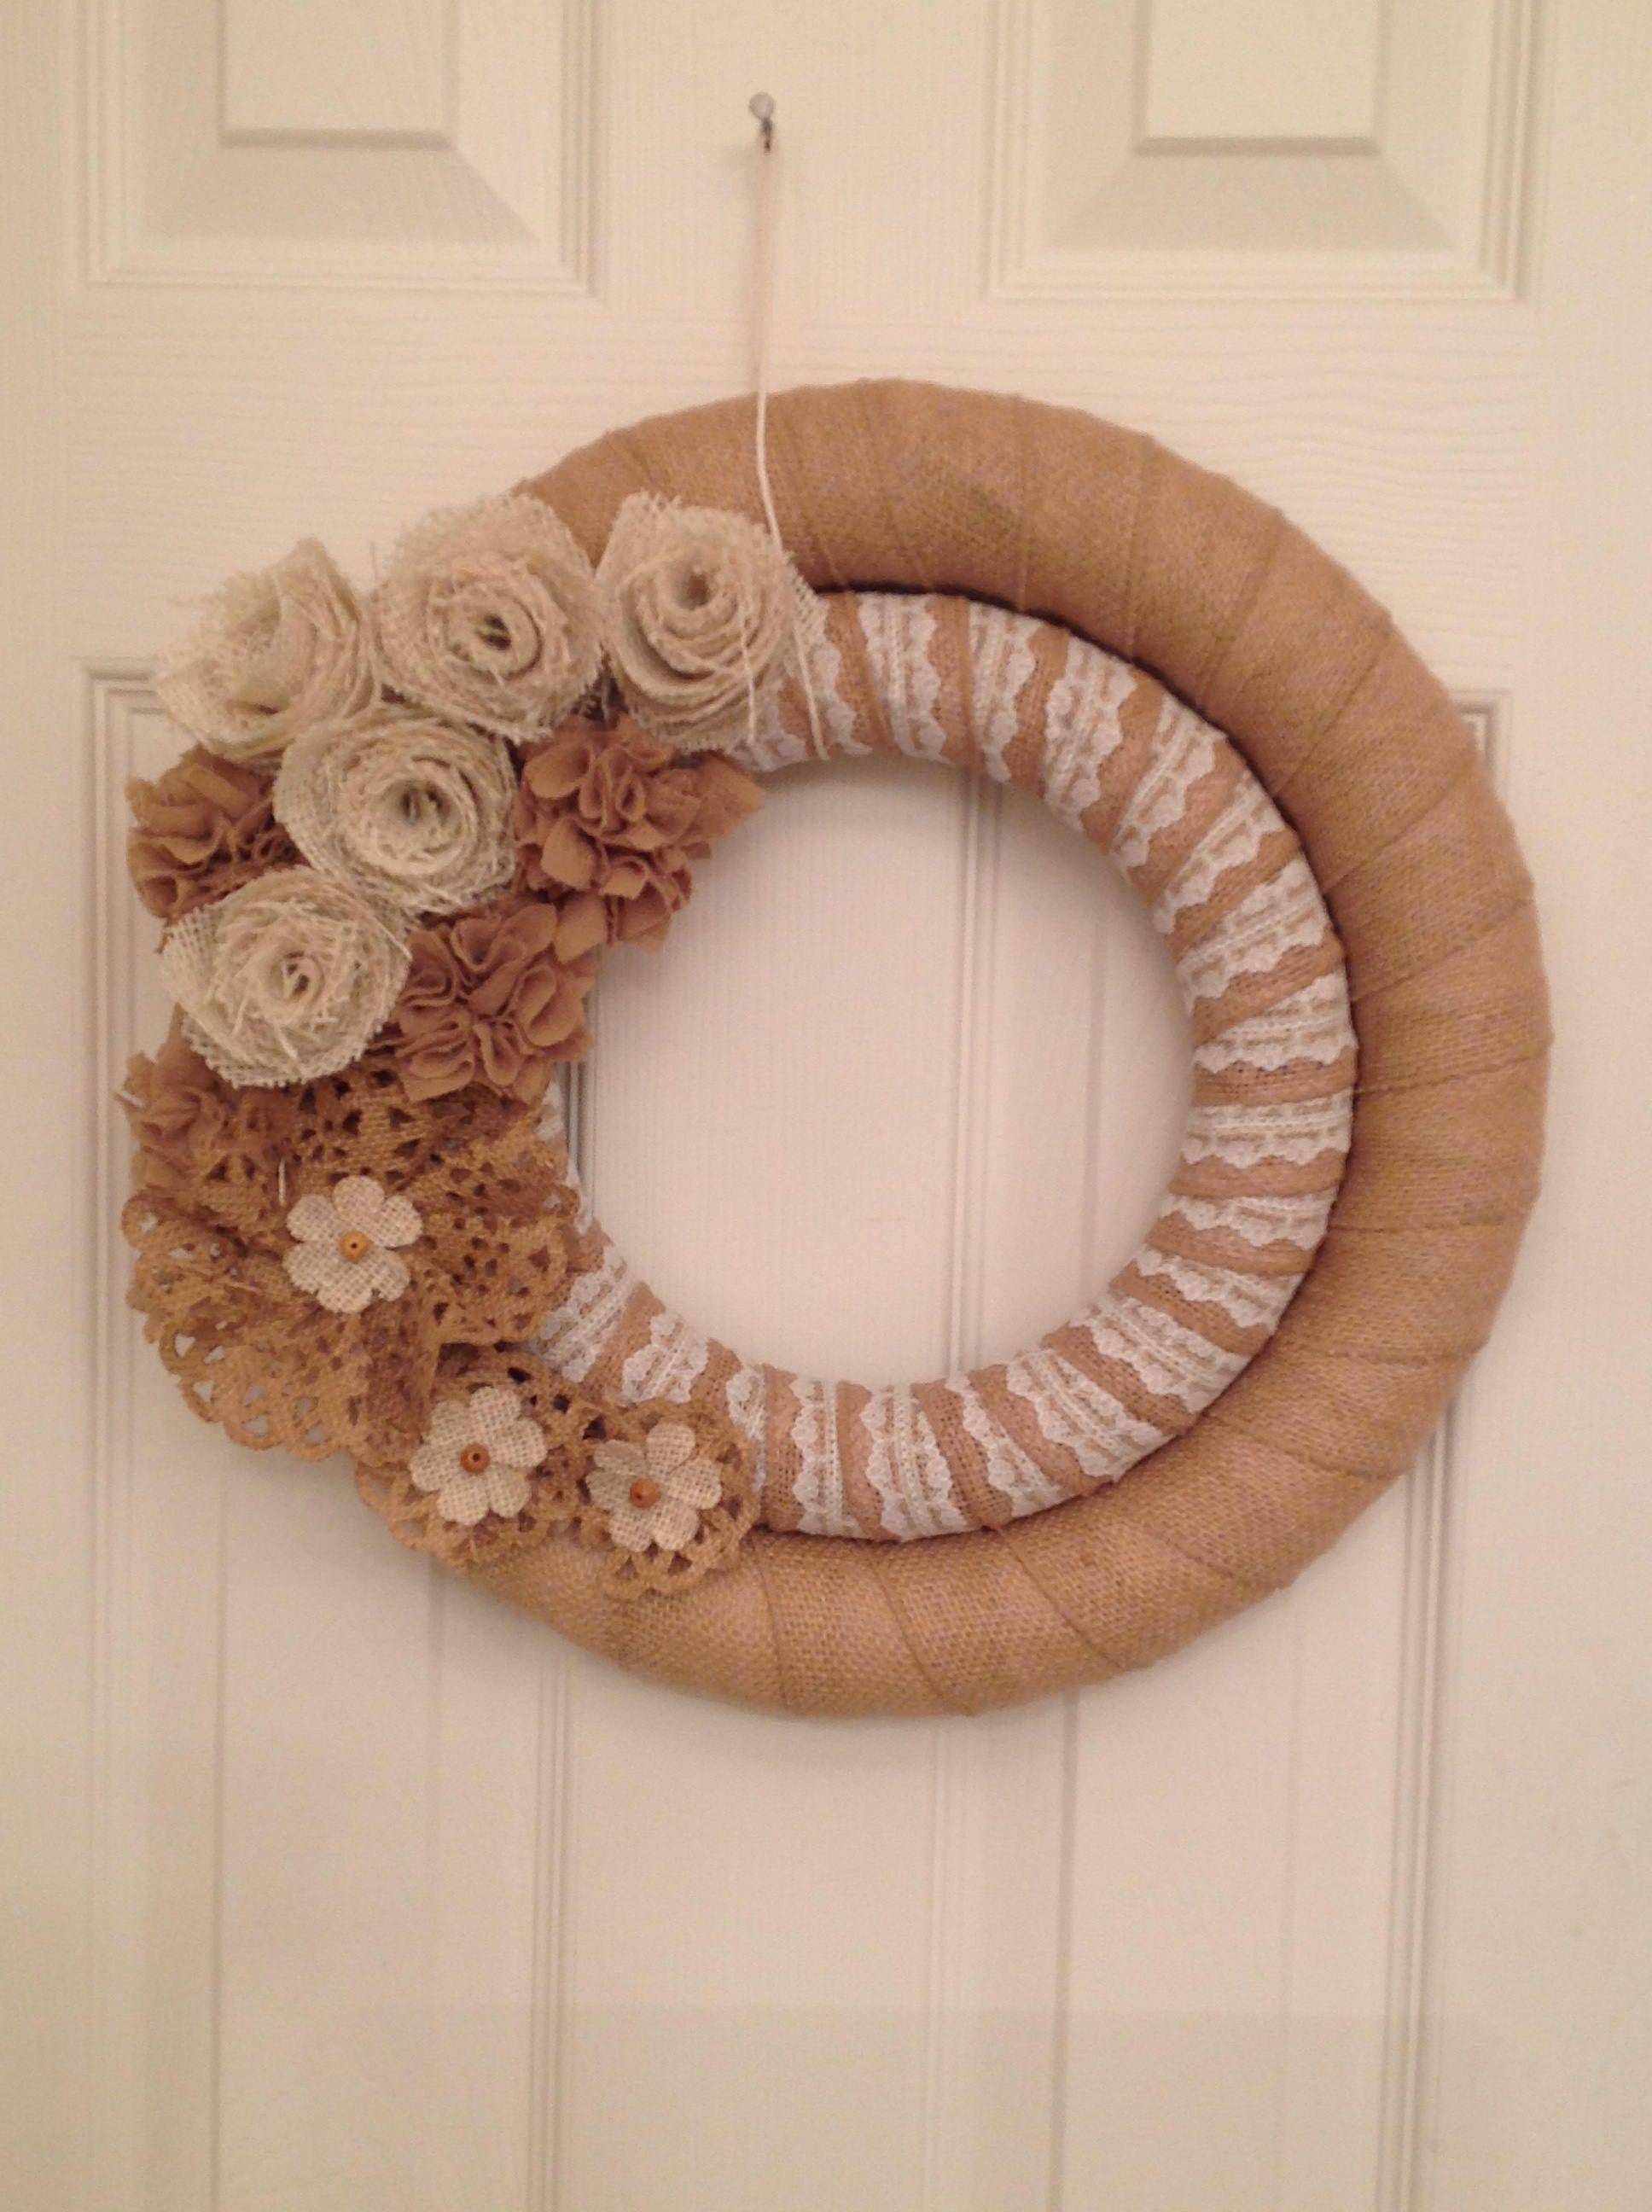 Photo of Burlap wreath, summer wreath, burlap lace wreath, double-wound burlap wreath, shabby country, felt rose, vintage look, peasant wreath